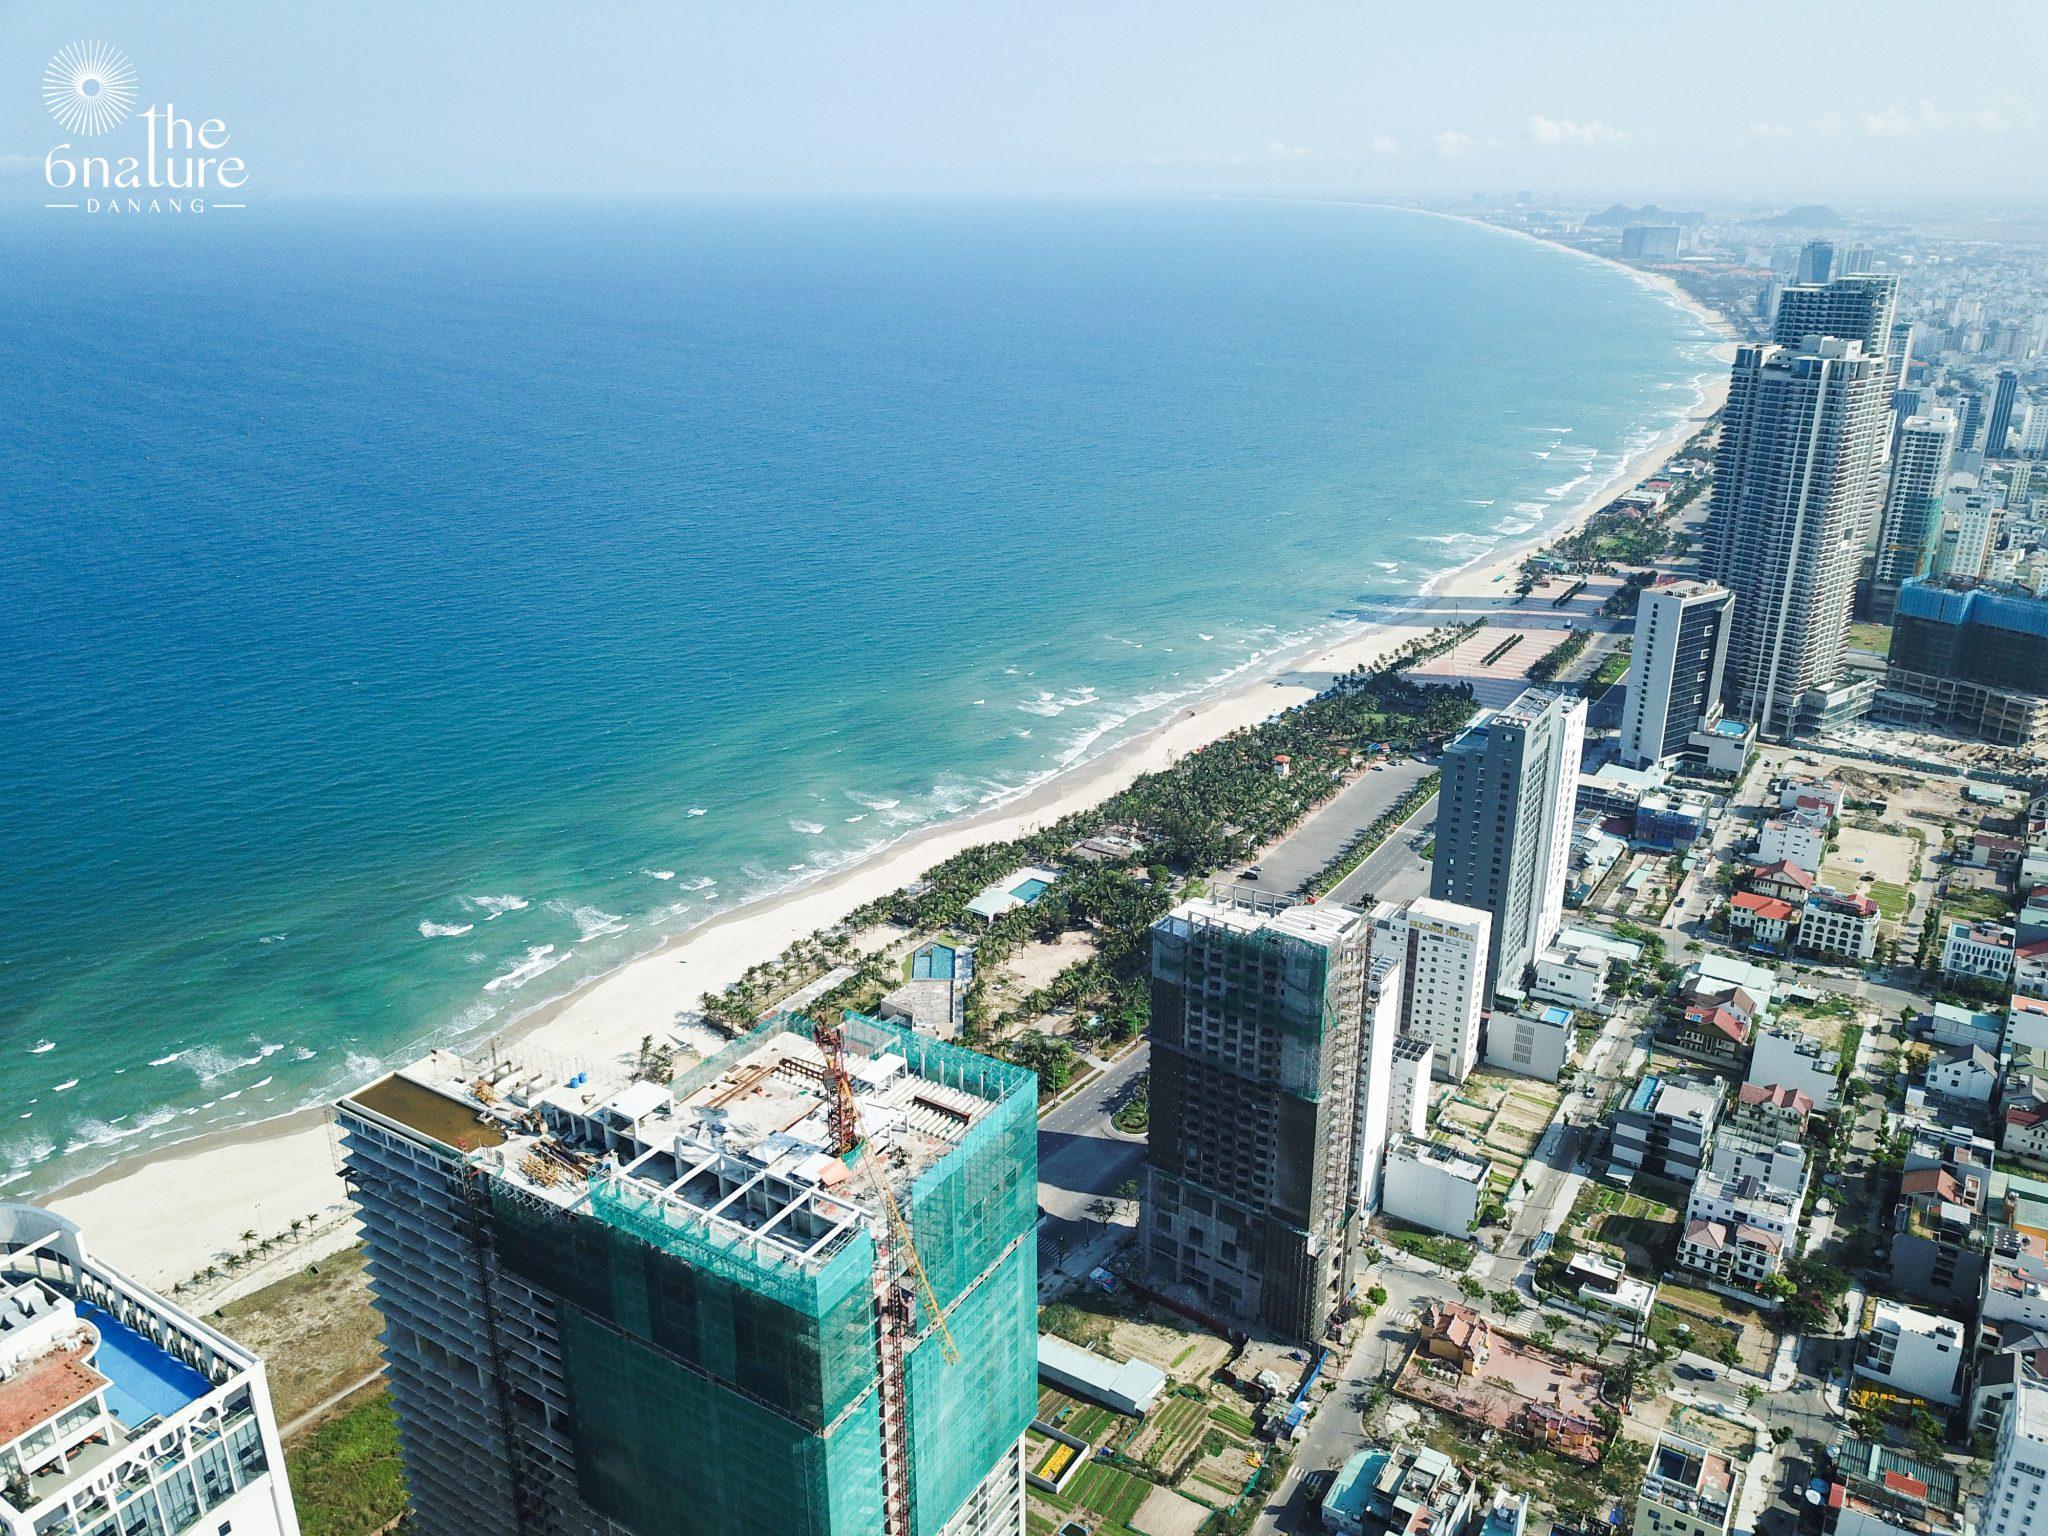 DJI 0072 6Nature - Danang Real Estate - Beachfront luxury condo for sale - Stunning location